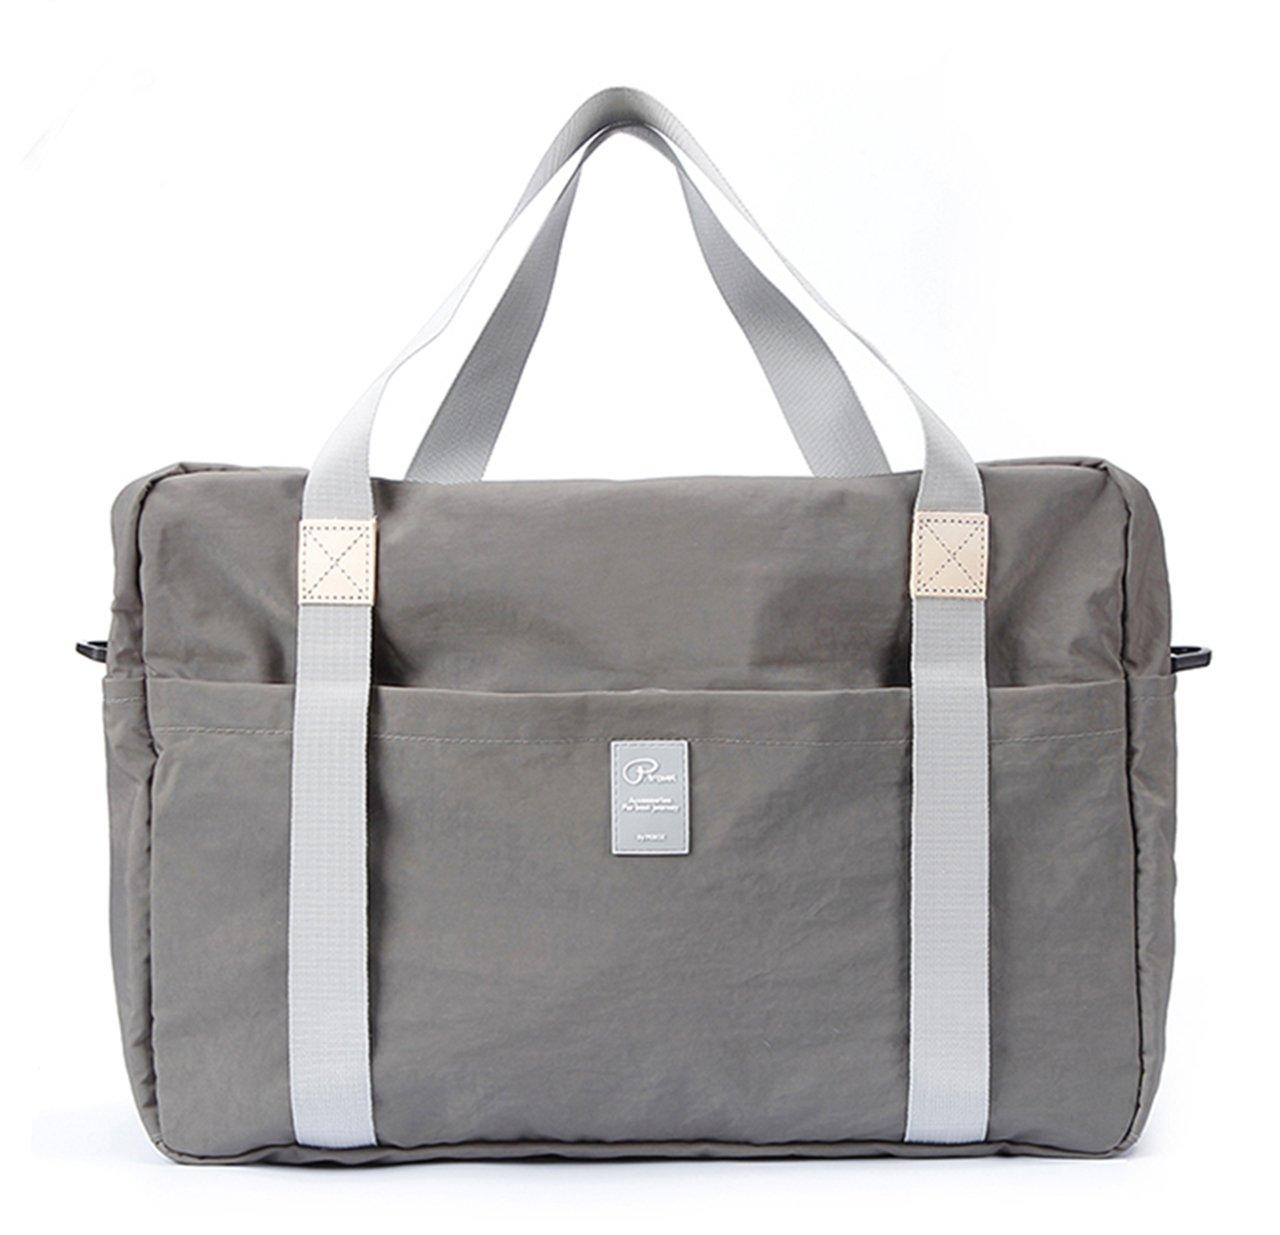 Women Foldable Canvas Bag,Waterproof,Lightweight,Weekender Travel Casual Shoulder Trolley Bag (Middle Grey)